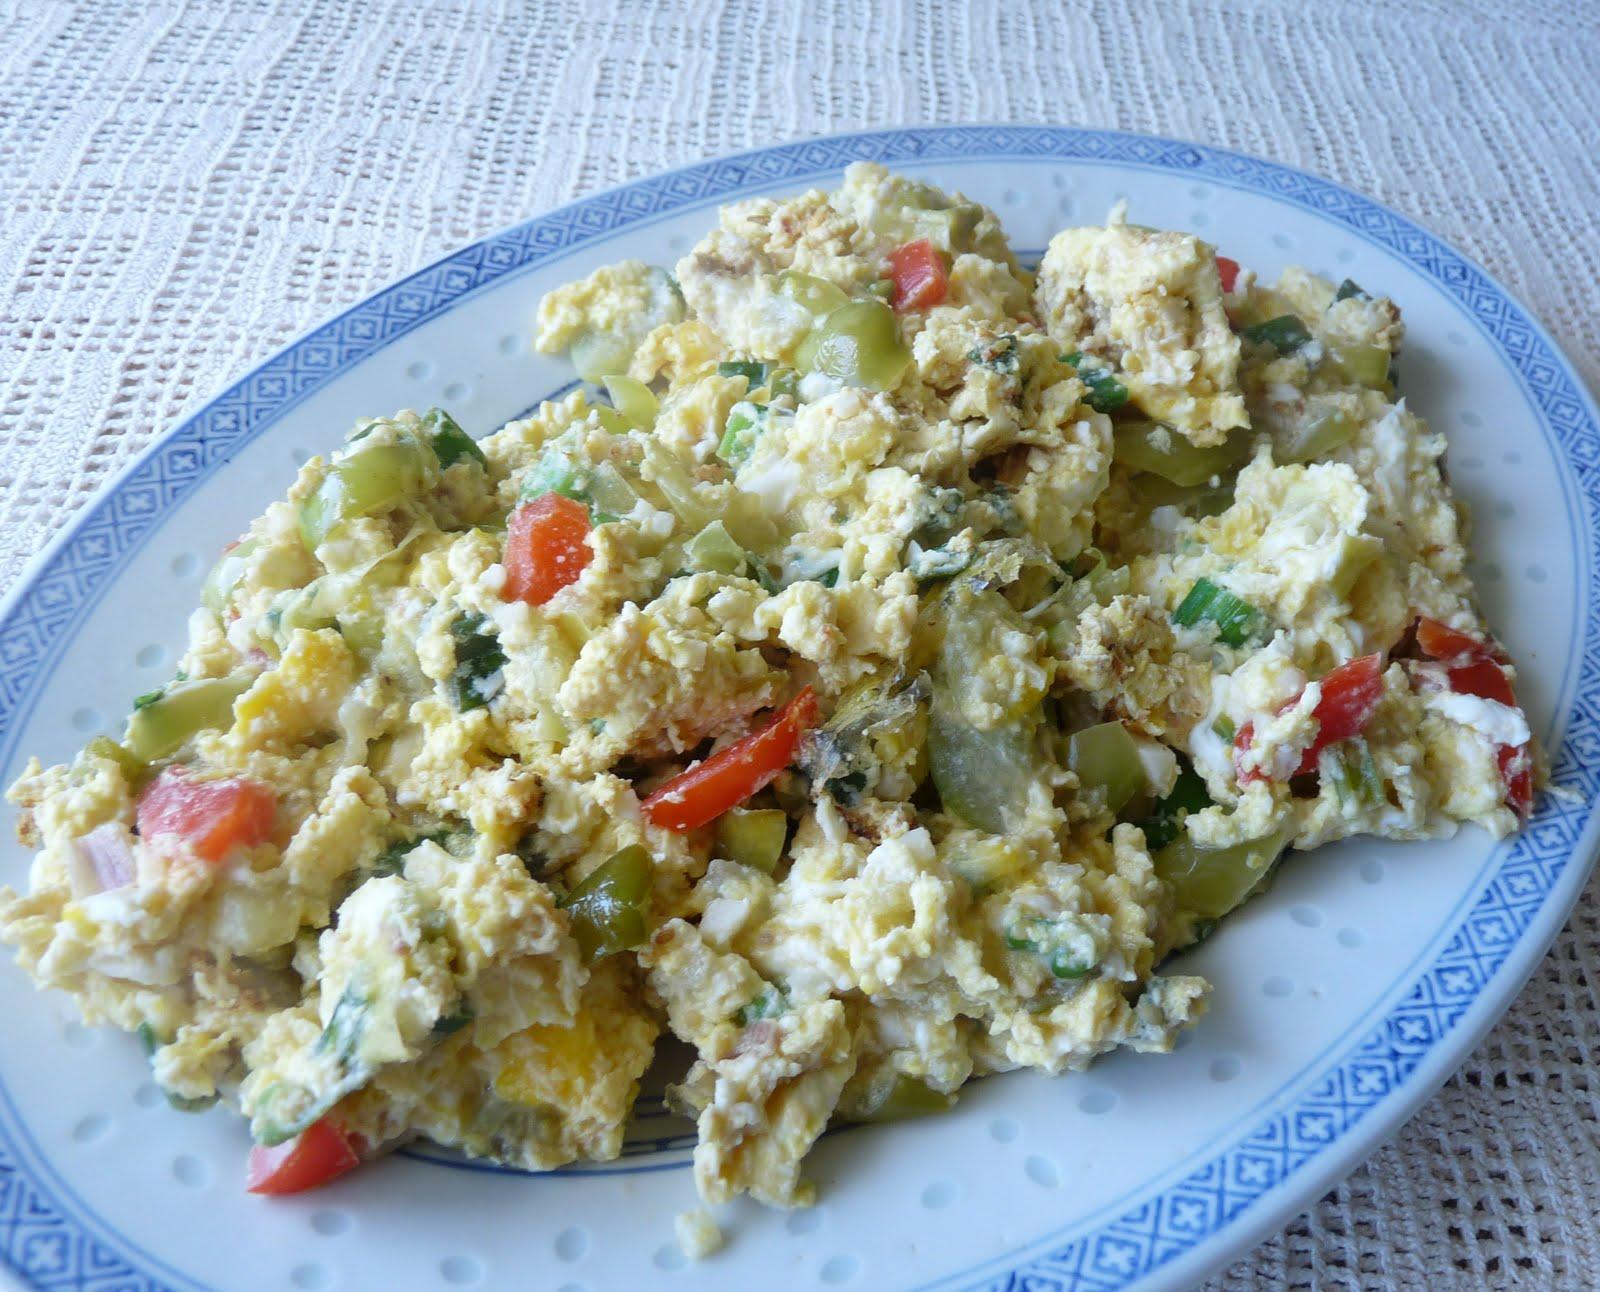 Seasonal Ontario Food: Scrambled Eggs with Tomatillos